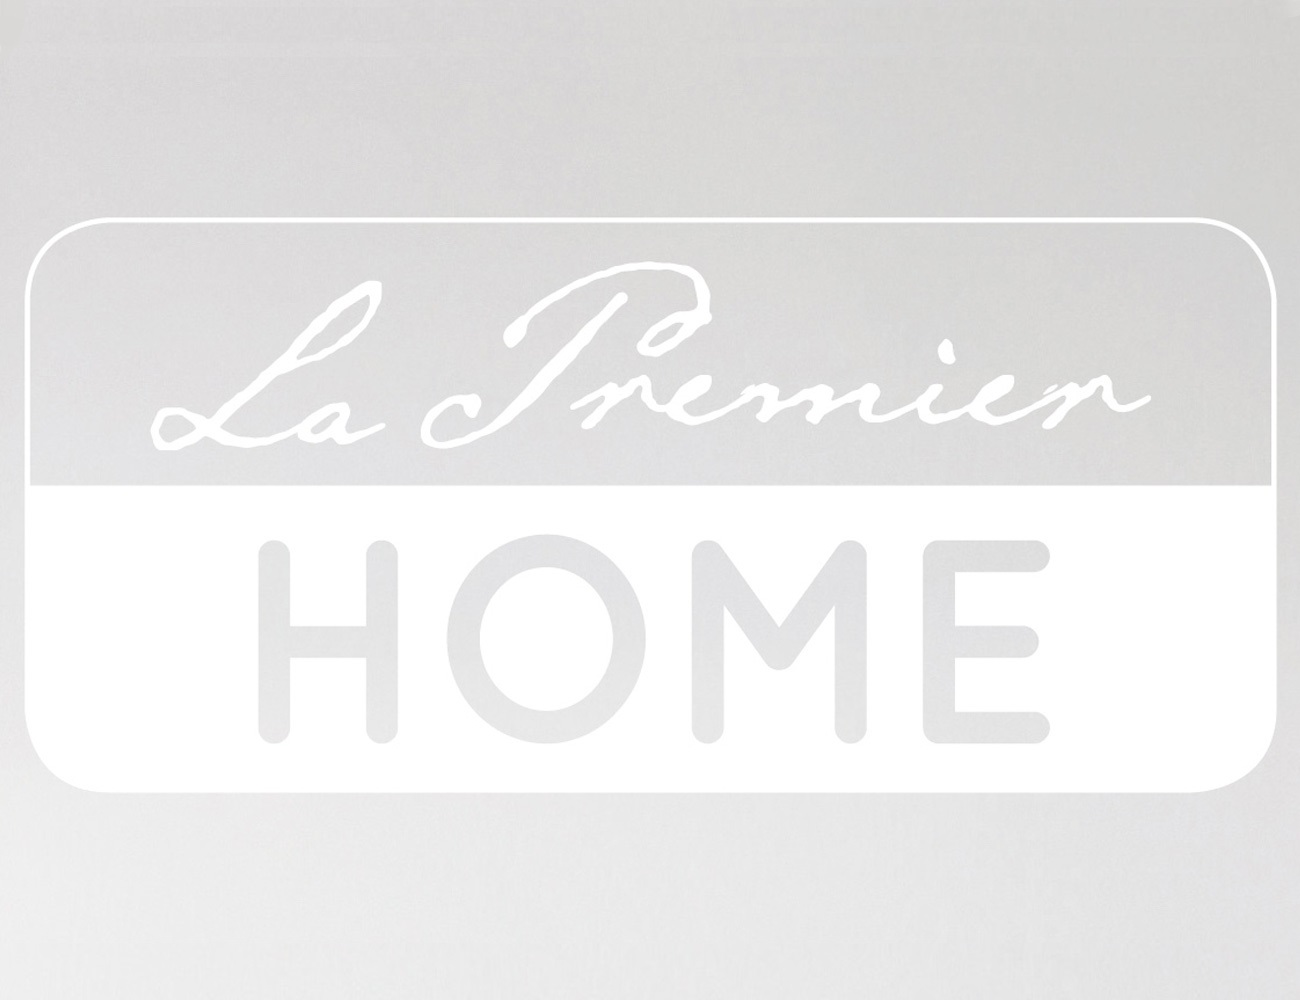 Logo la premier home